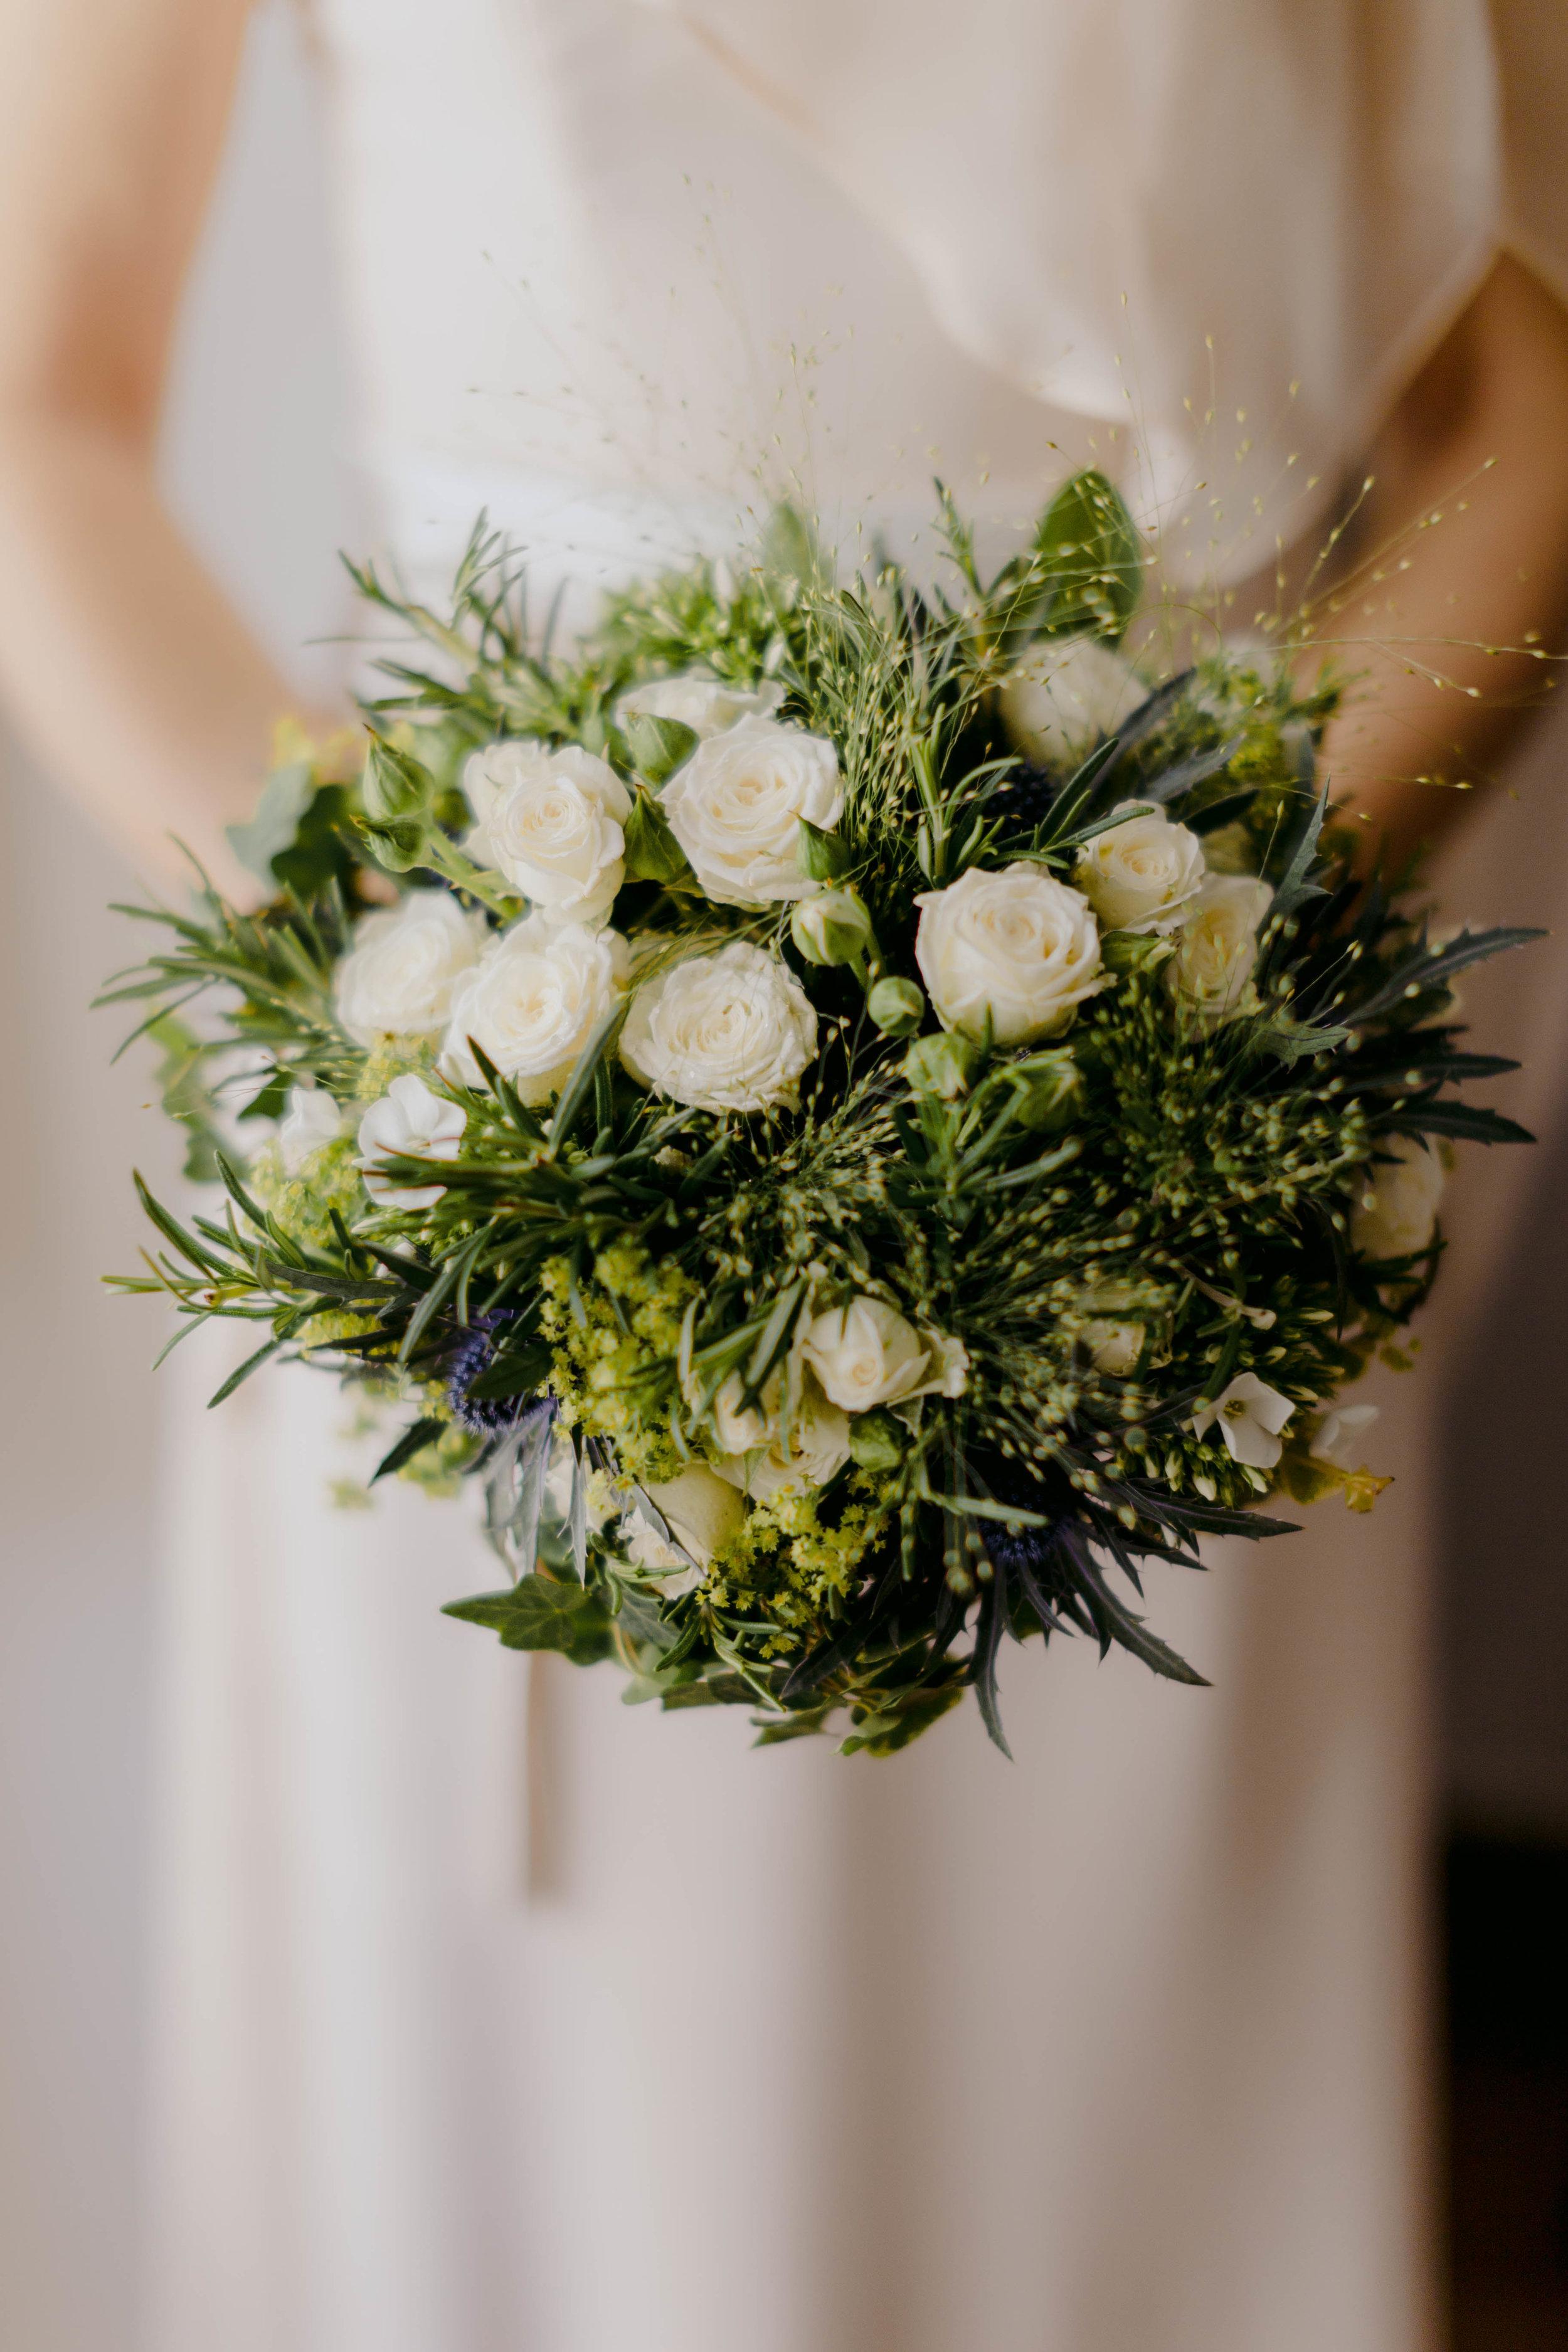 097 - Preparazione sposi.jpg